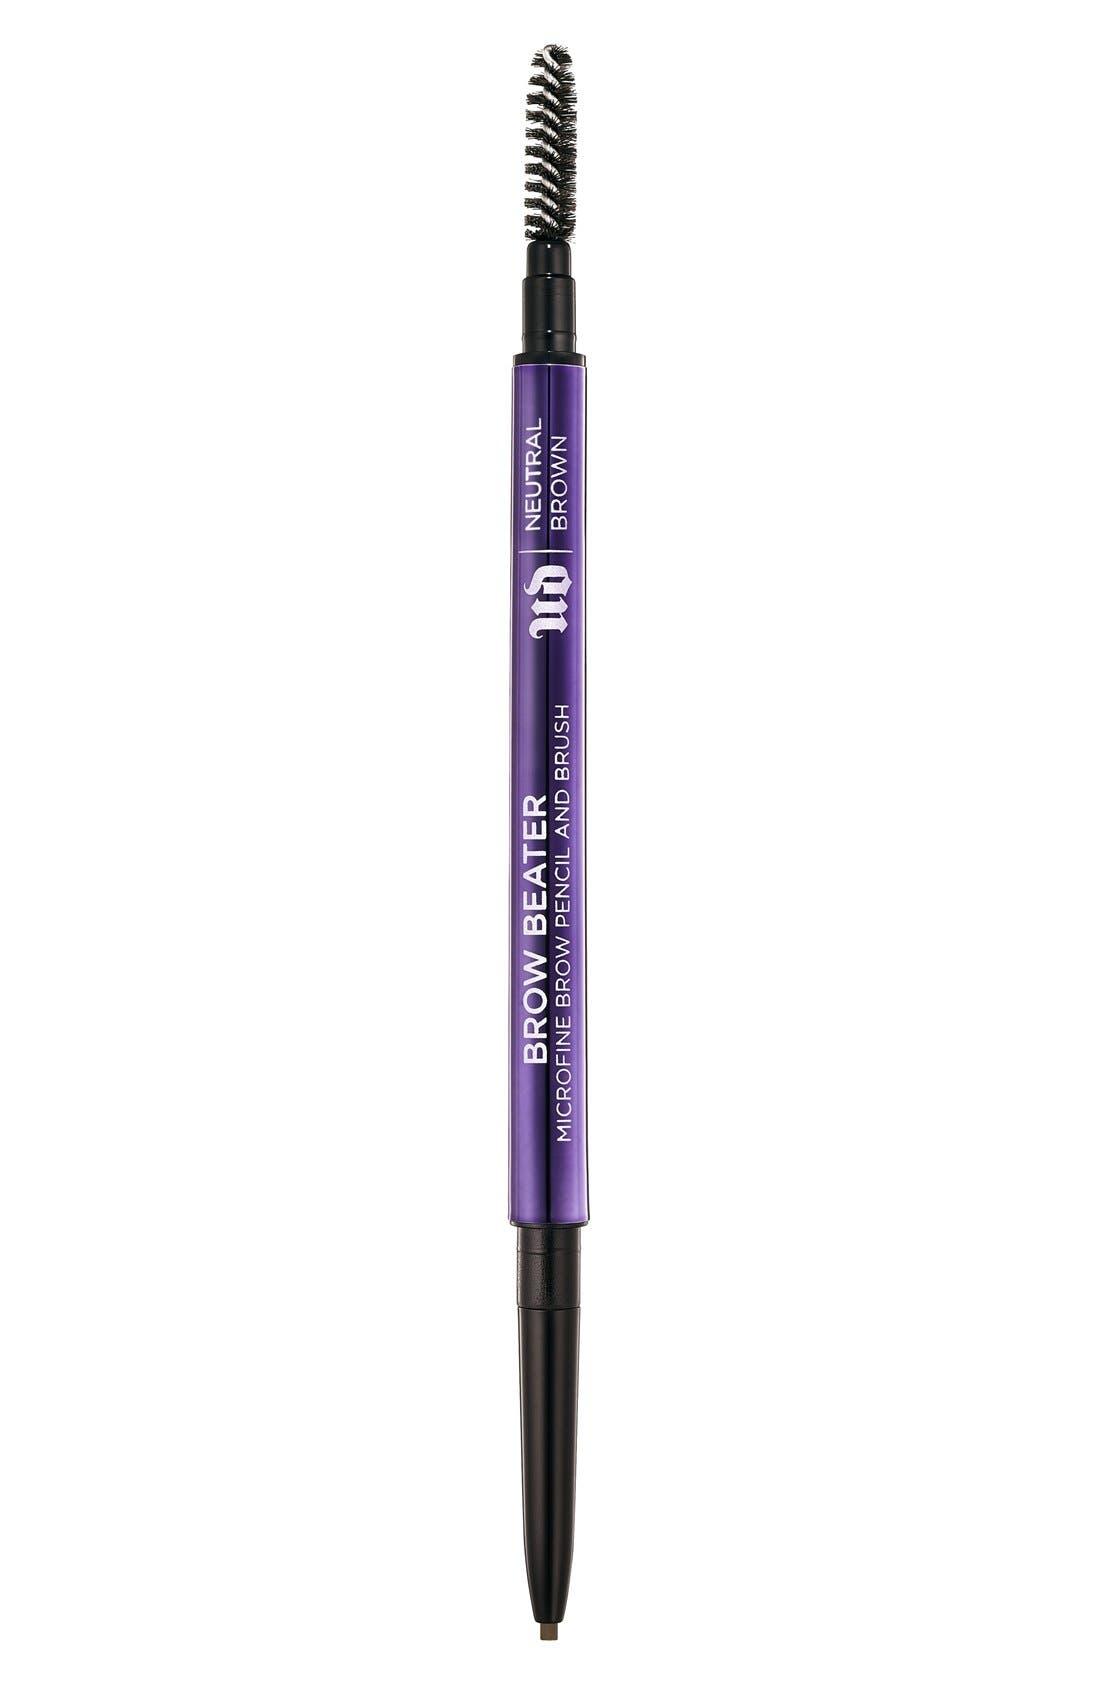 Brow Beater Microfine Brow Pencil & Brush,                             Main thumbnail 1, color,                             NEUTRAL BROWN